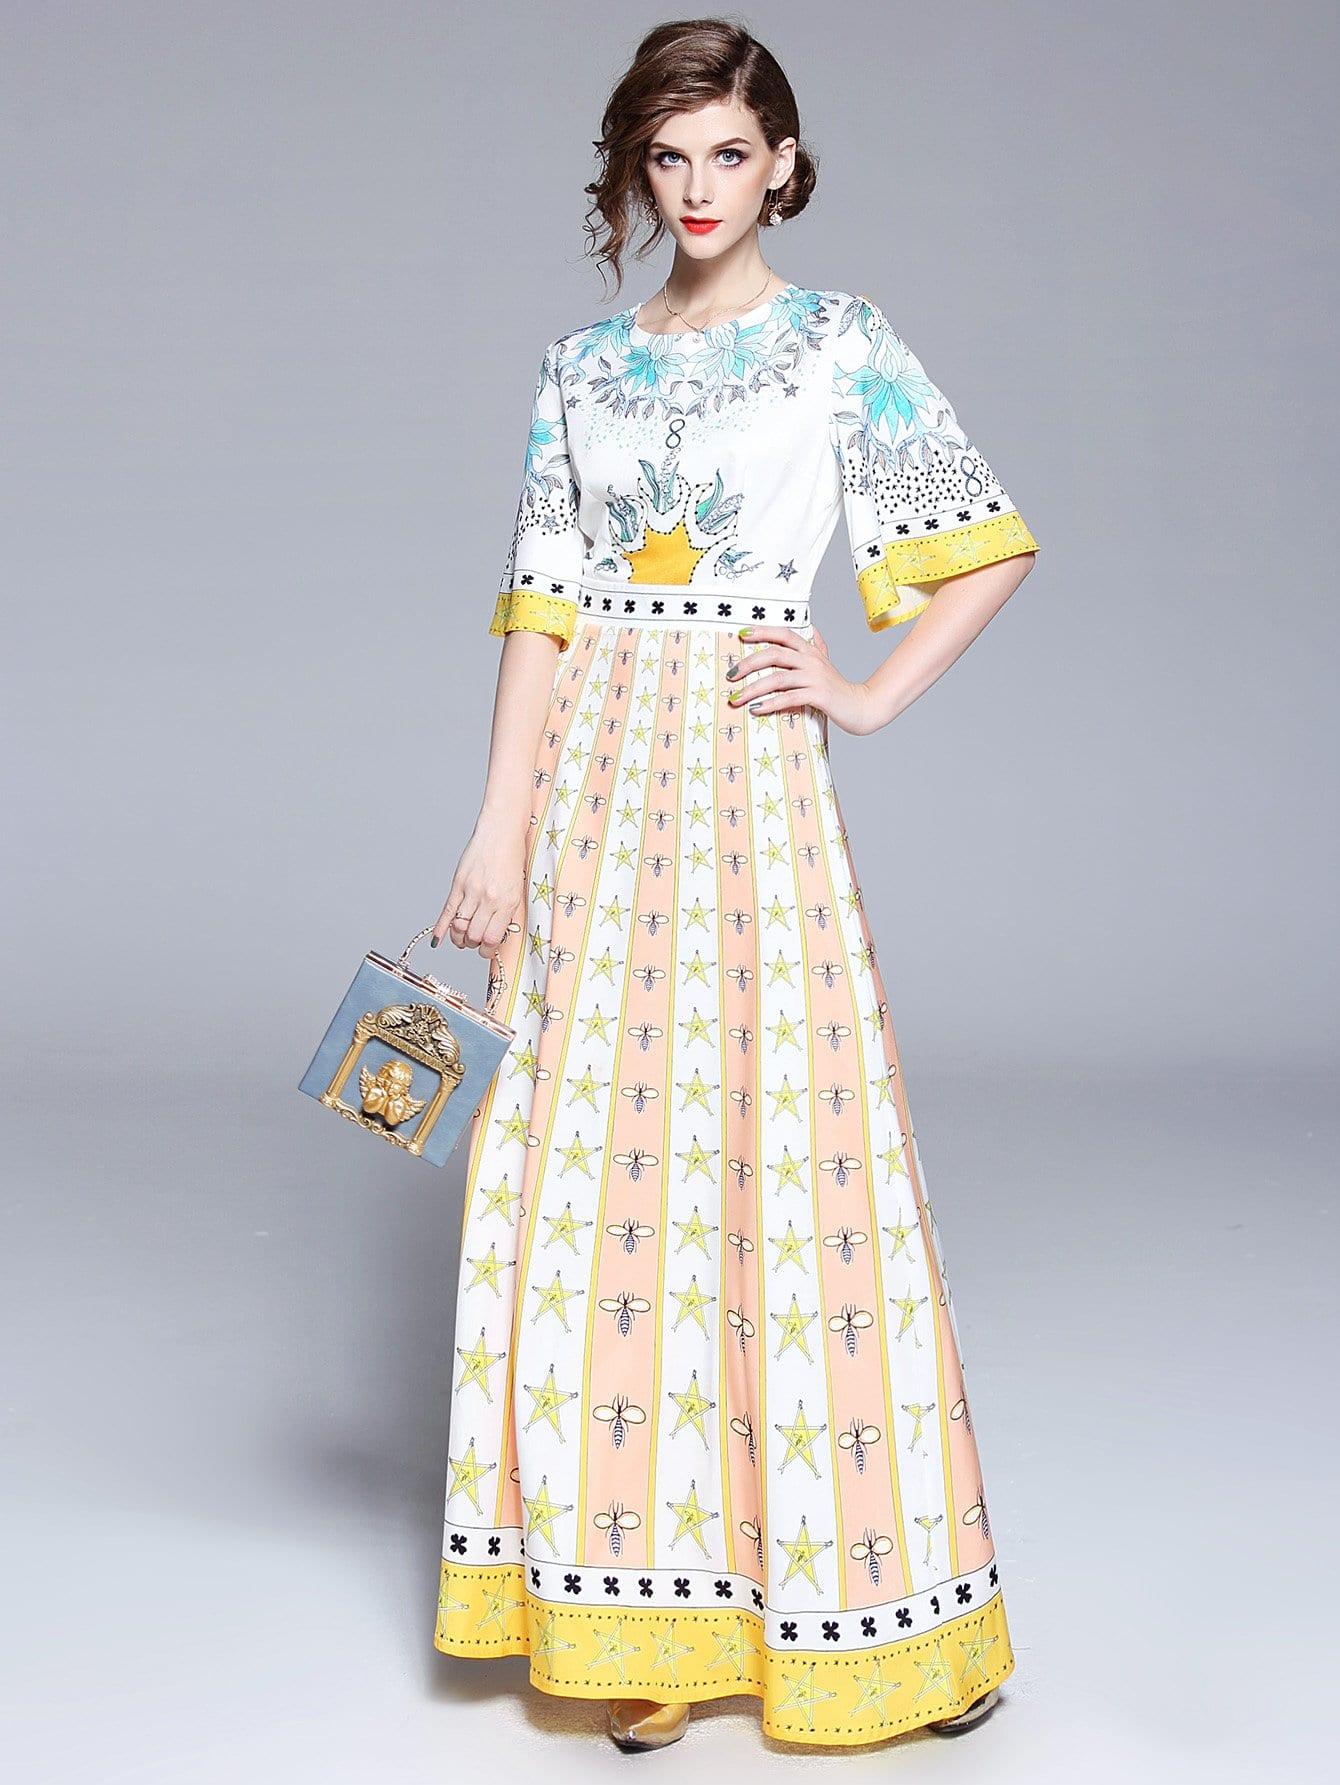 Купить Платье с коротким рукавом с коротким рукавом, null, SheIn